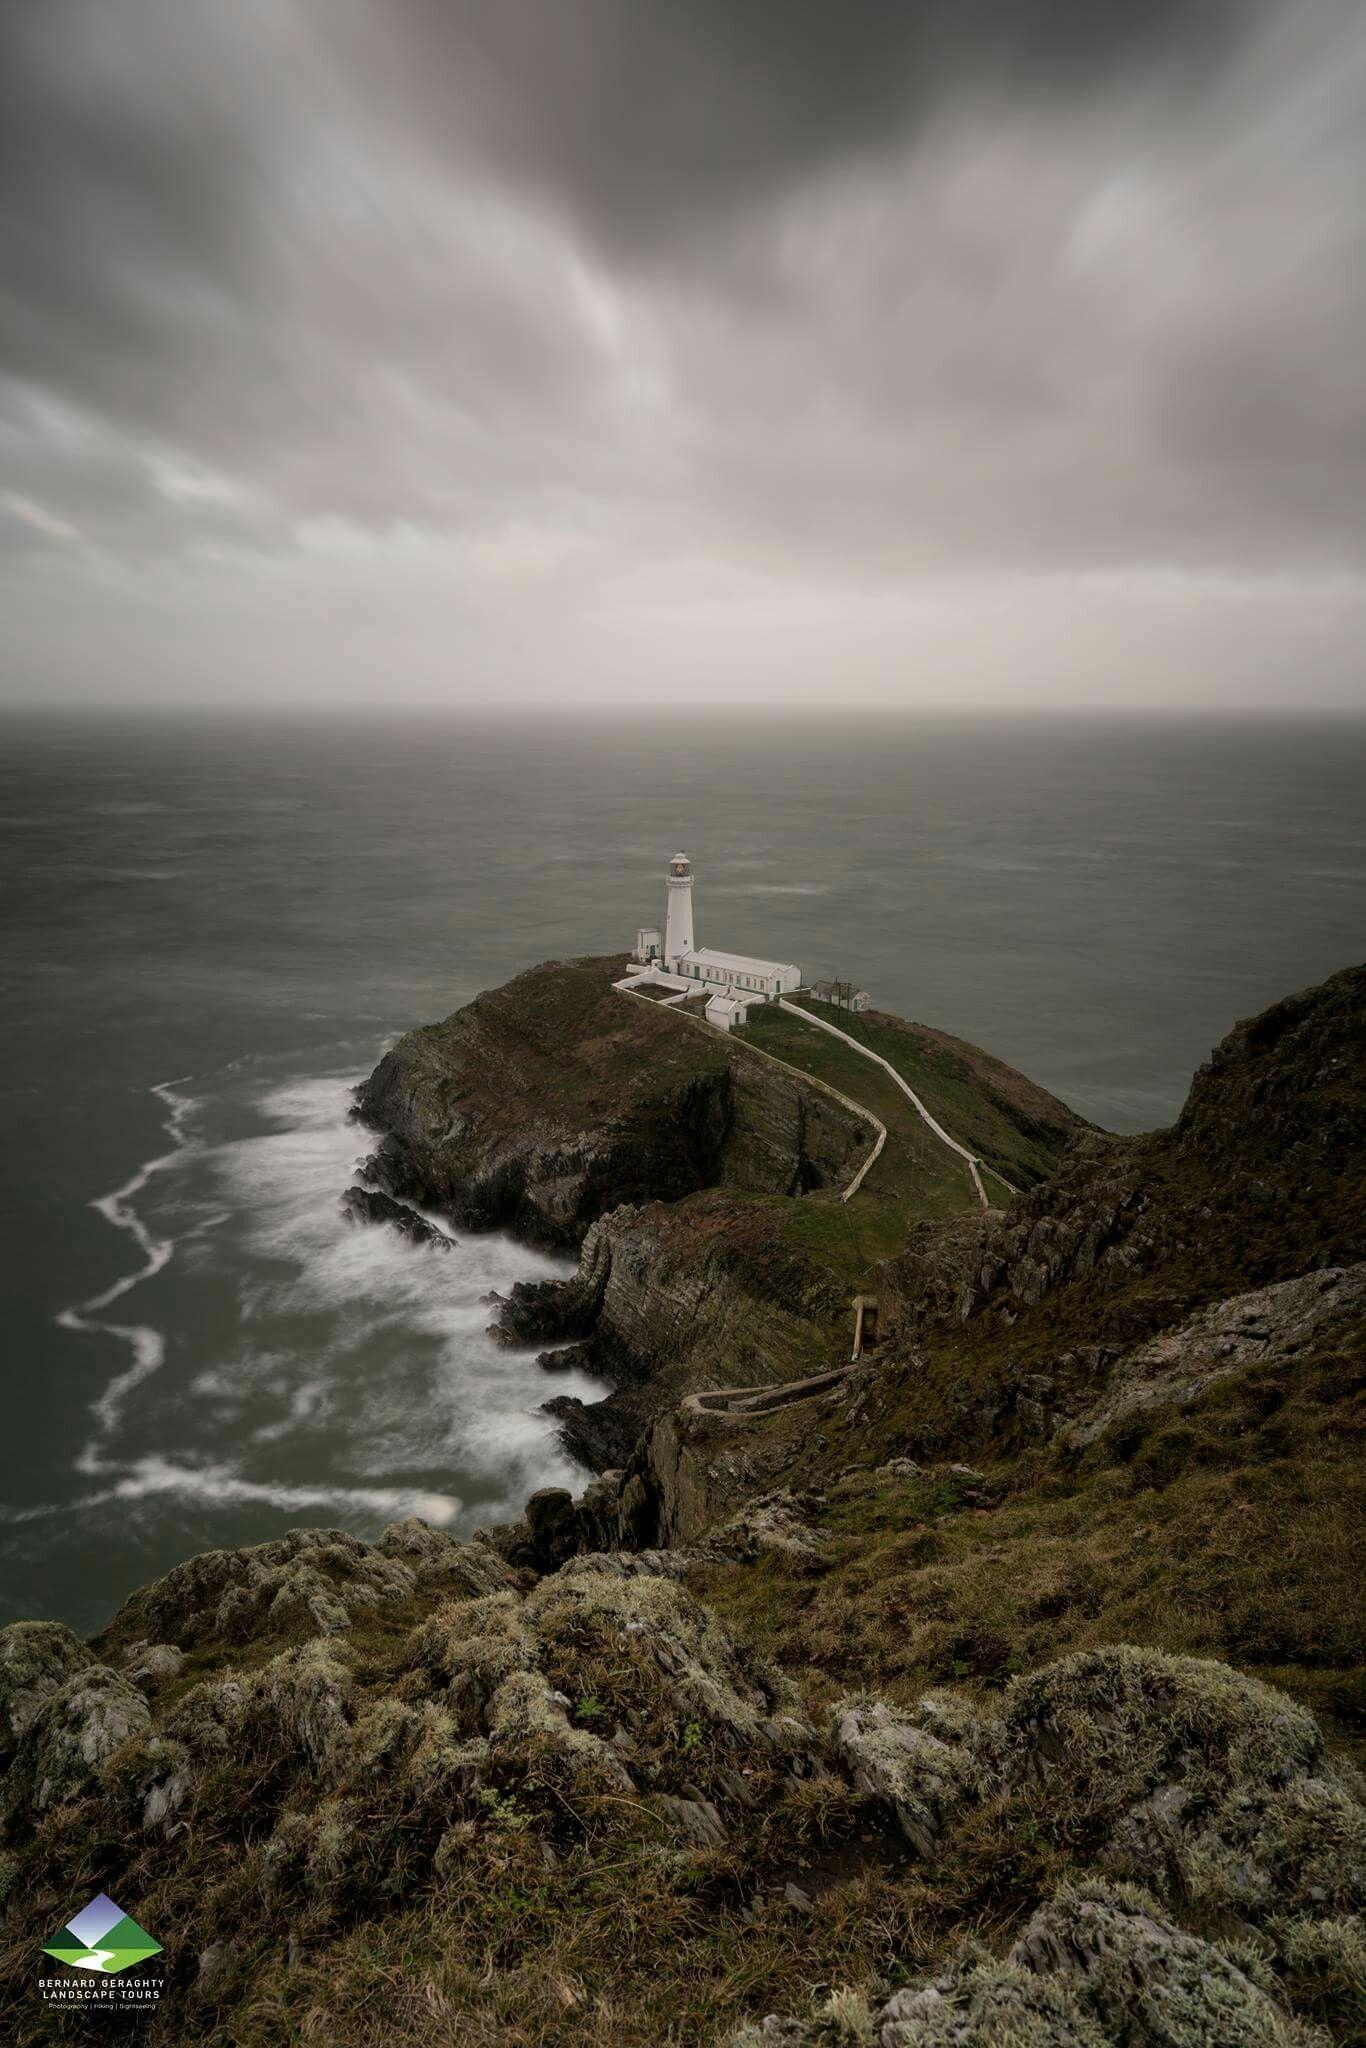 Landscape photography image by Tony Obrien on Irish